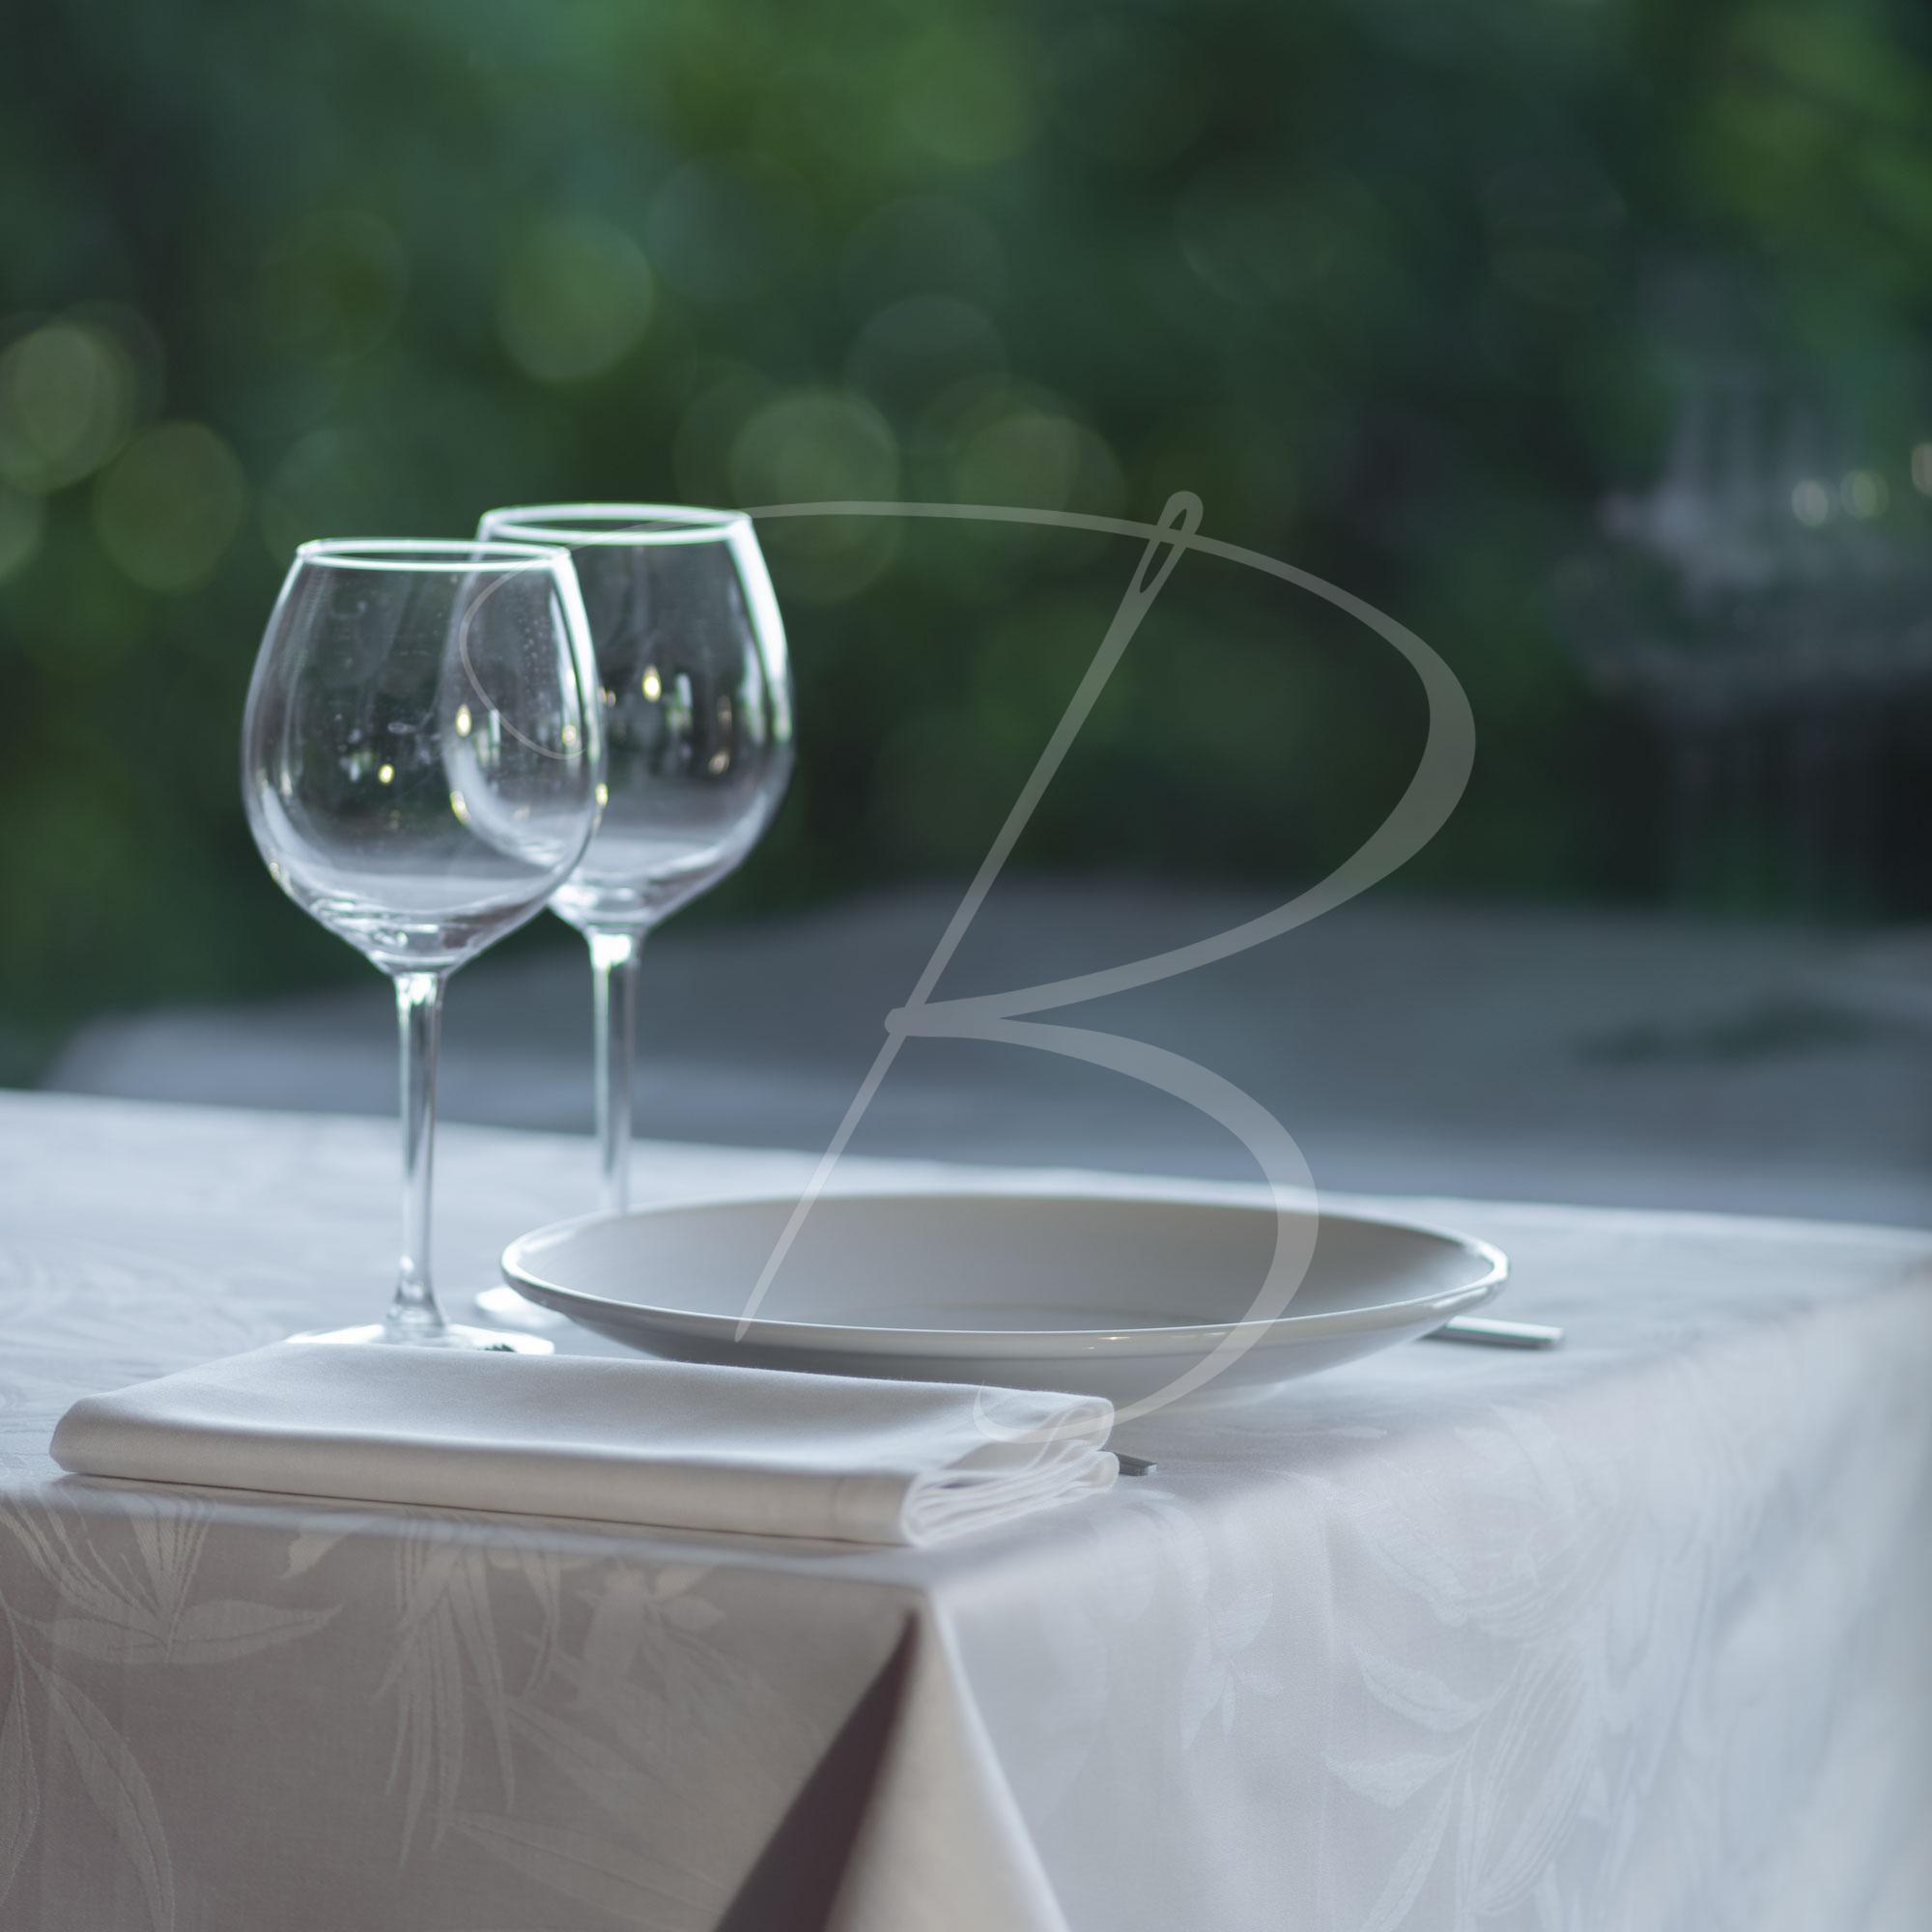 linge-table-moulin-a-vent-metis